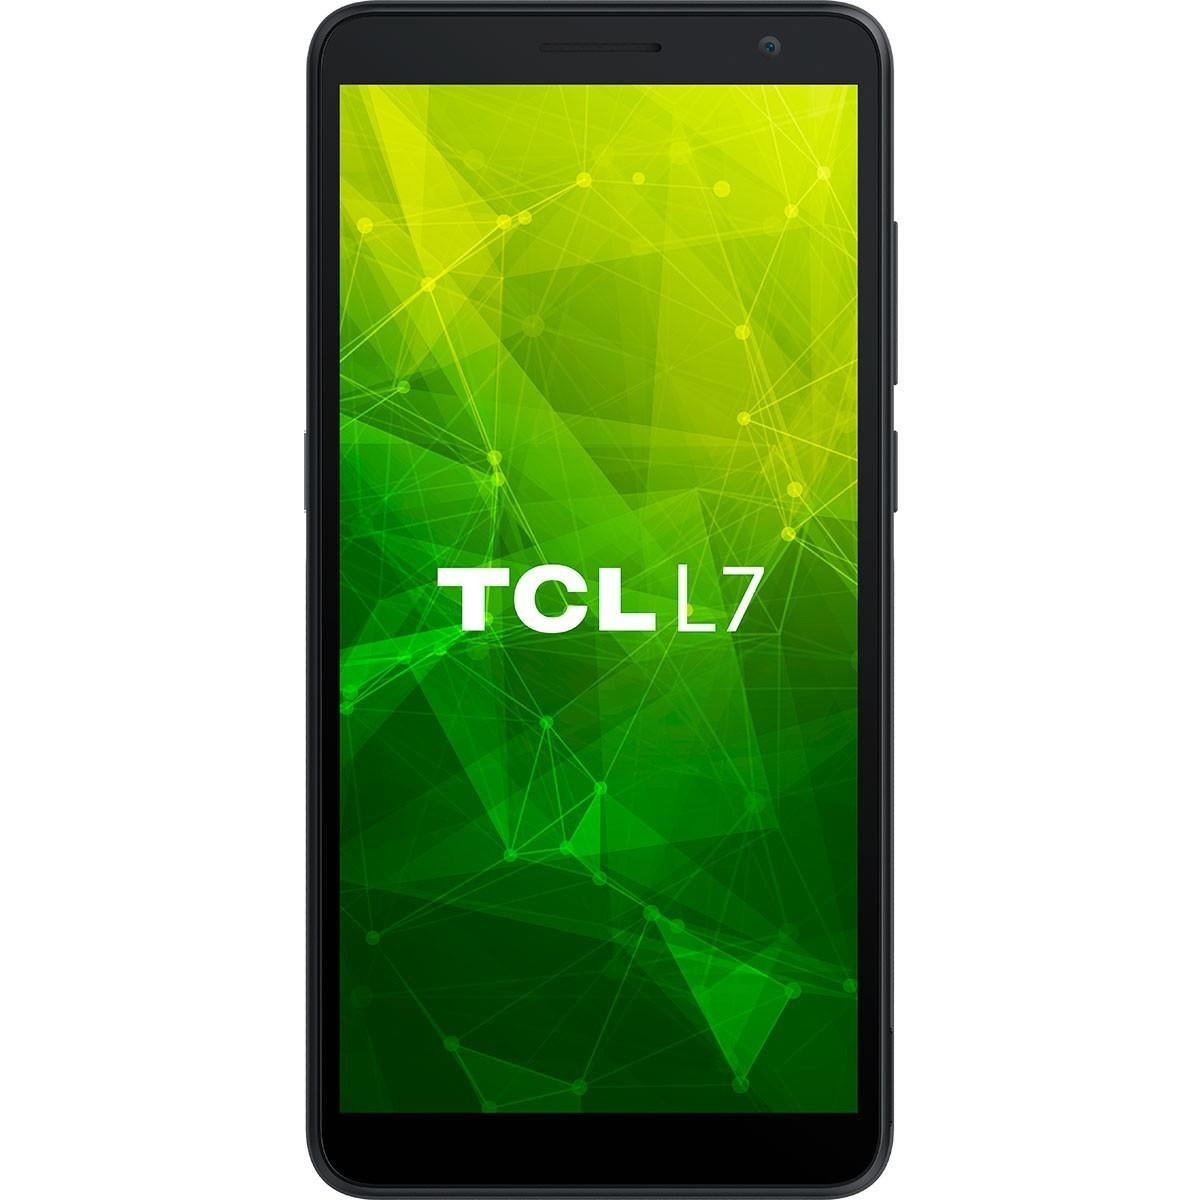 Smartphone TCL L7 Preto Dual Tela 5.5'' 4G 32GB 2GB Ram Quad-Core 8MP+5MP + Capa e Película